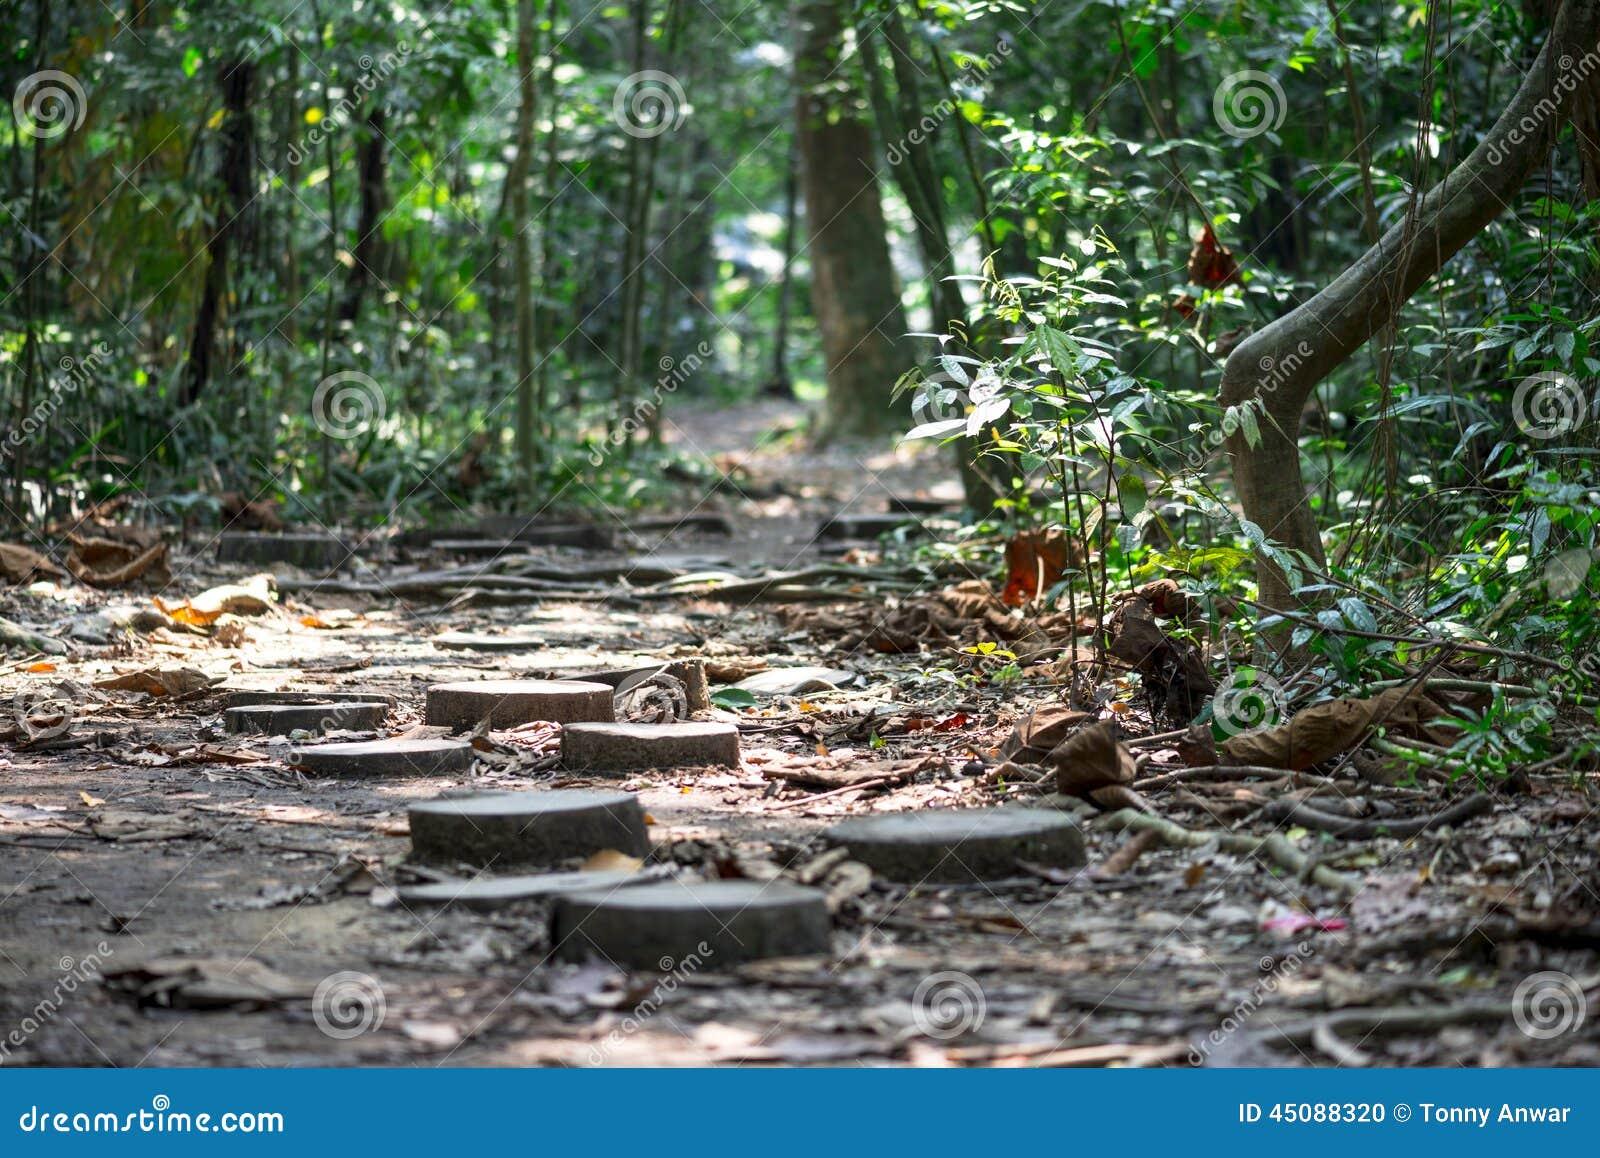 Nature Trail Stock Photo Image 45088320